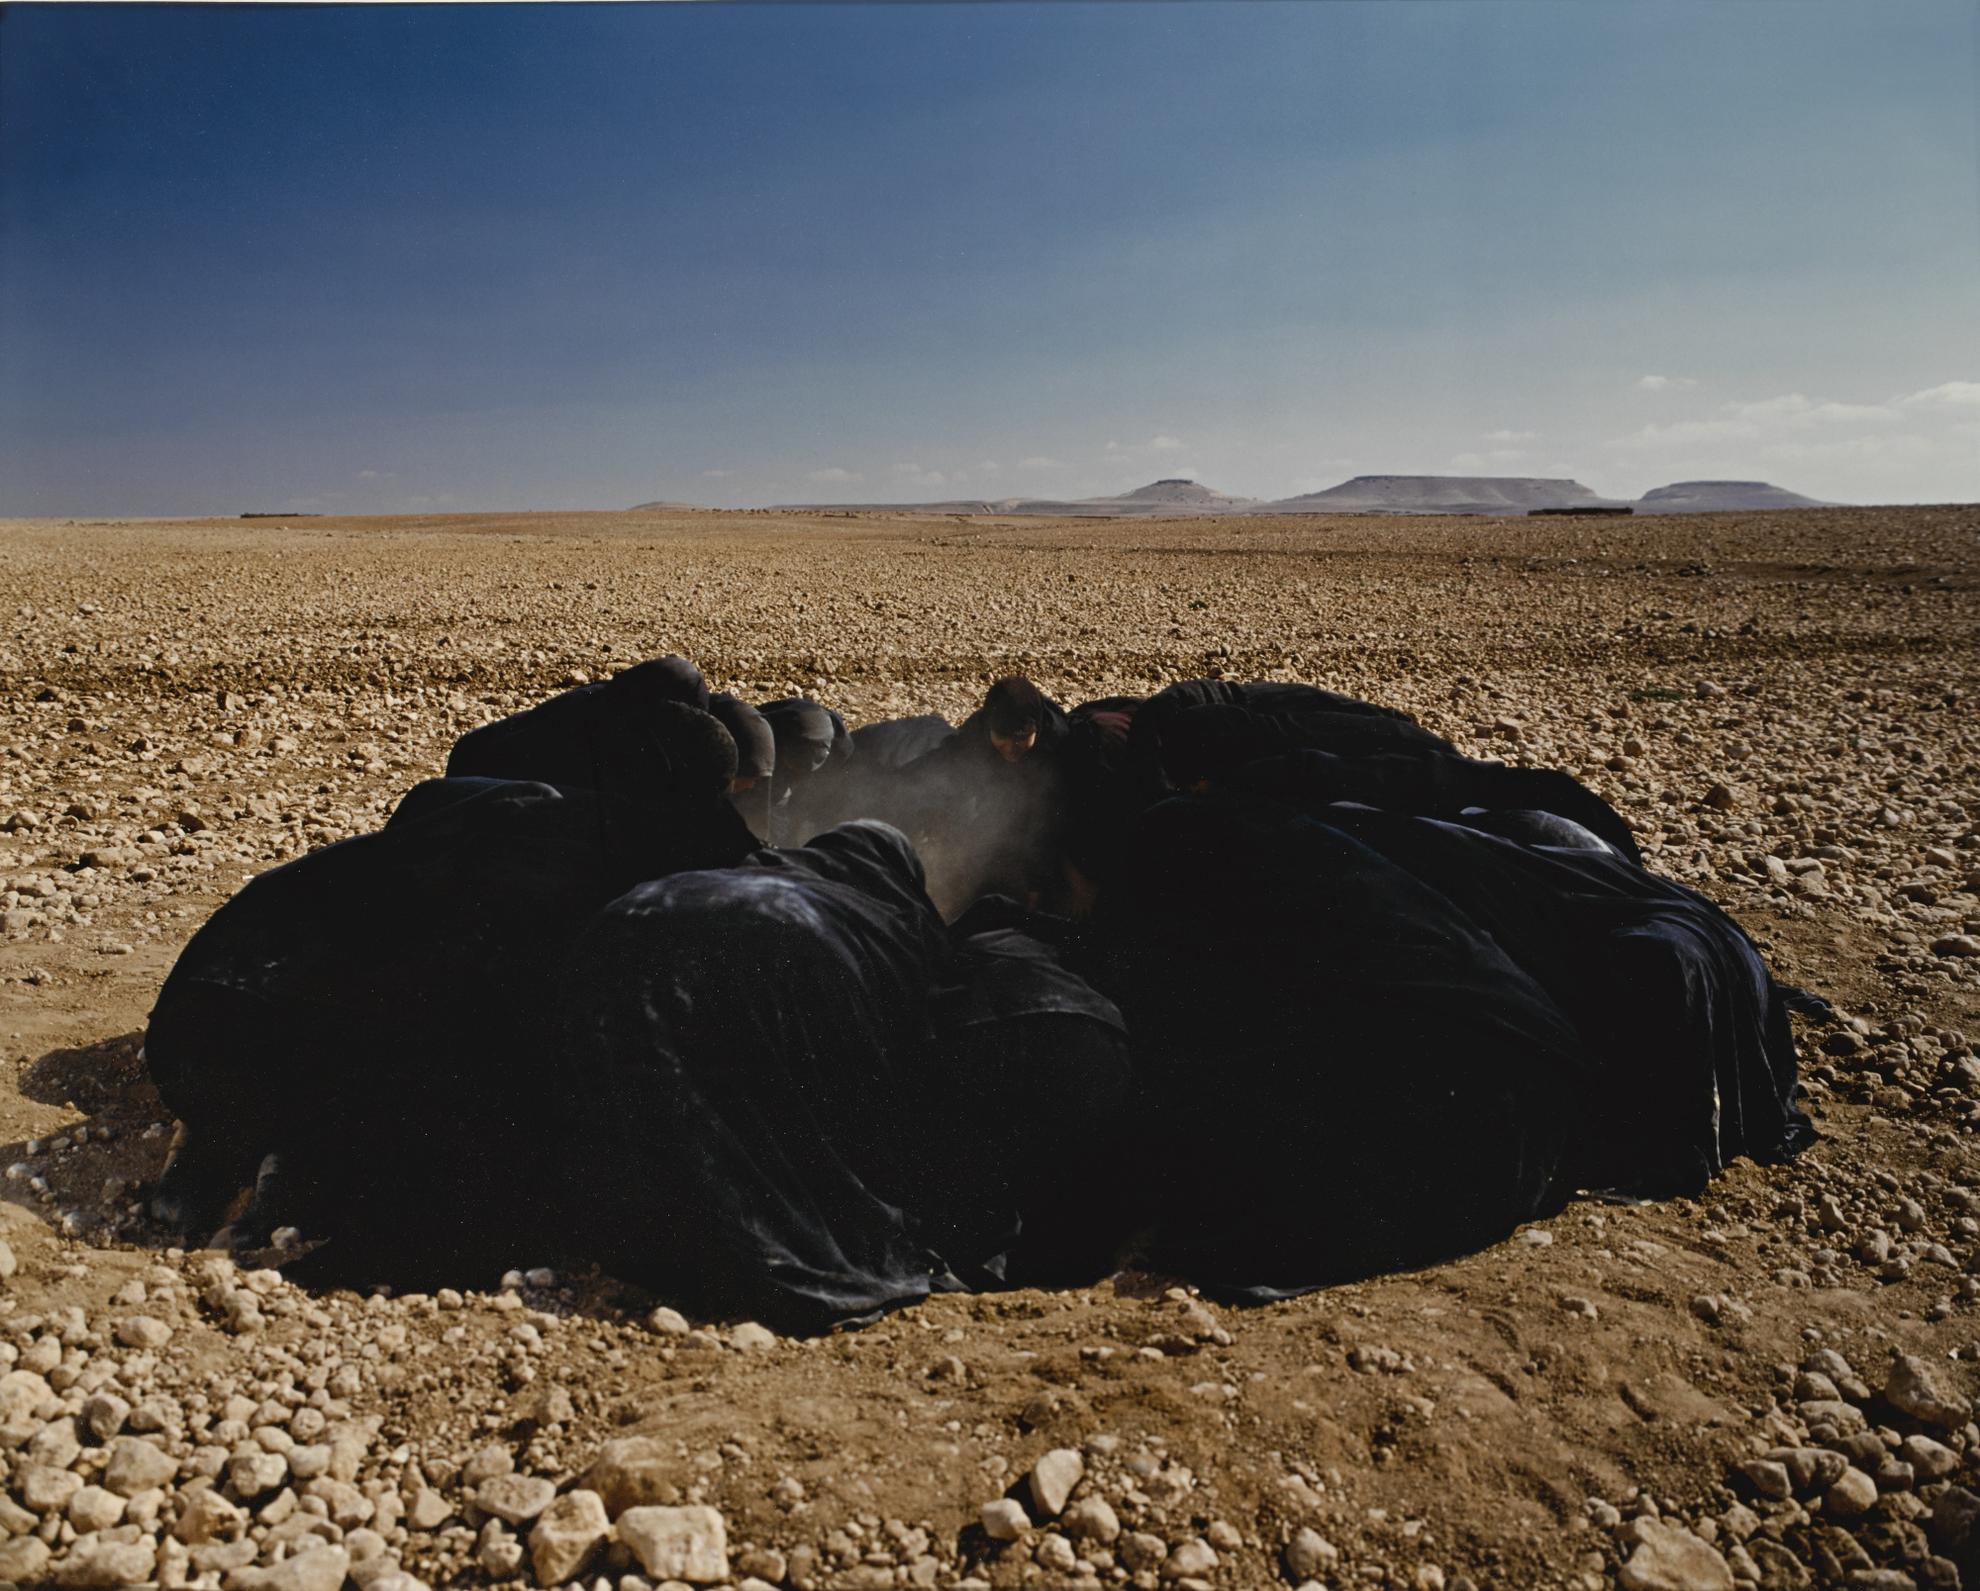 Shirin Neshat-Untitled (From Passage)-2001